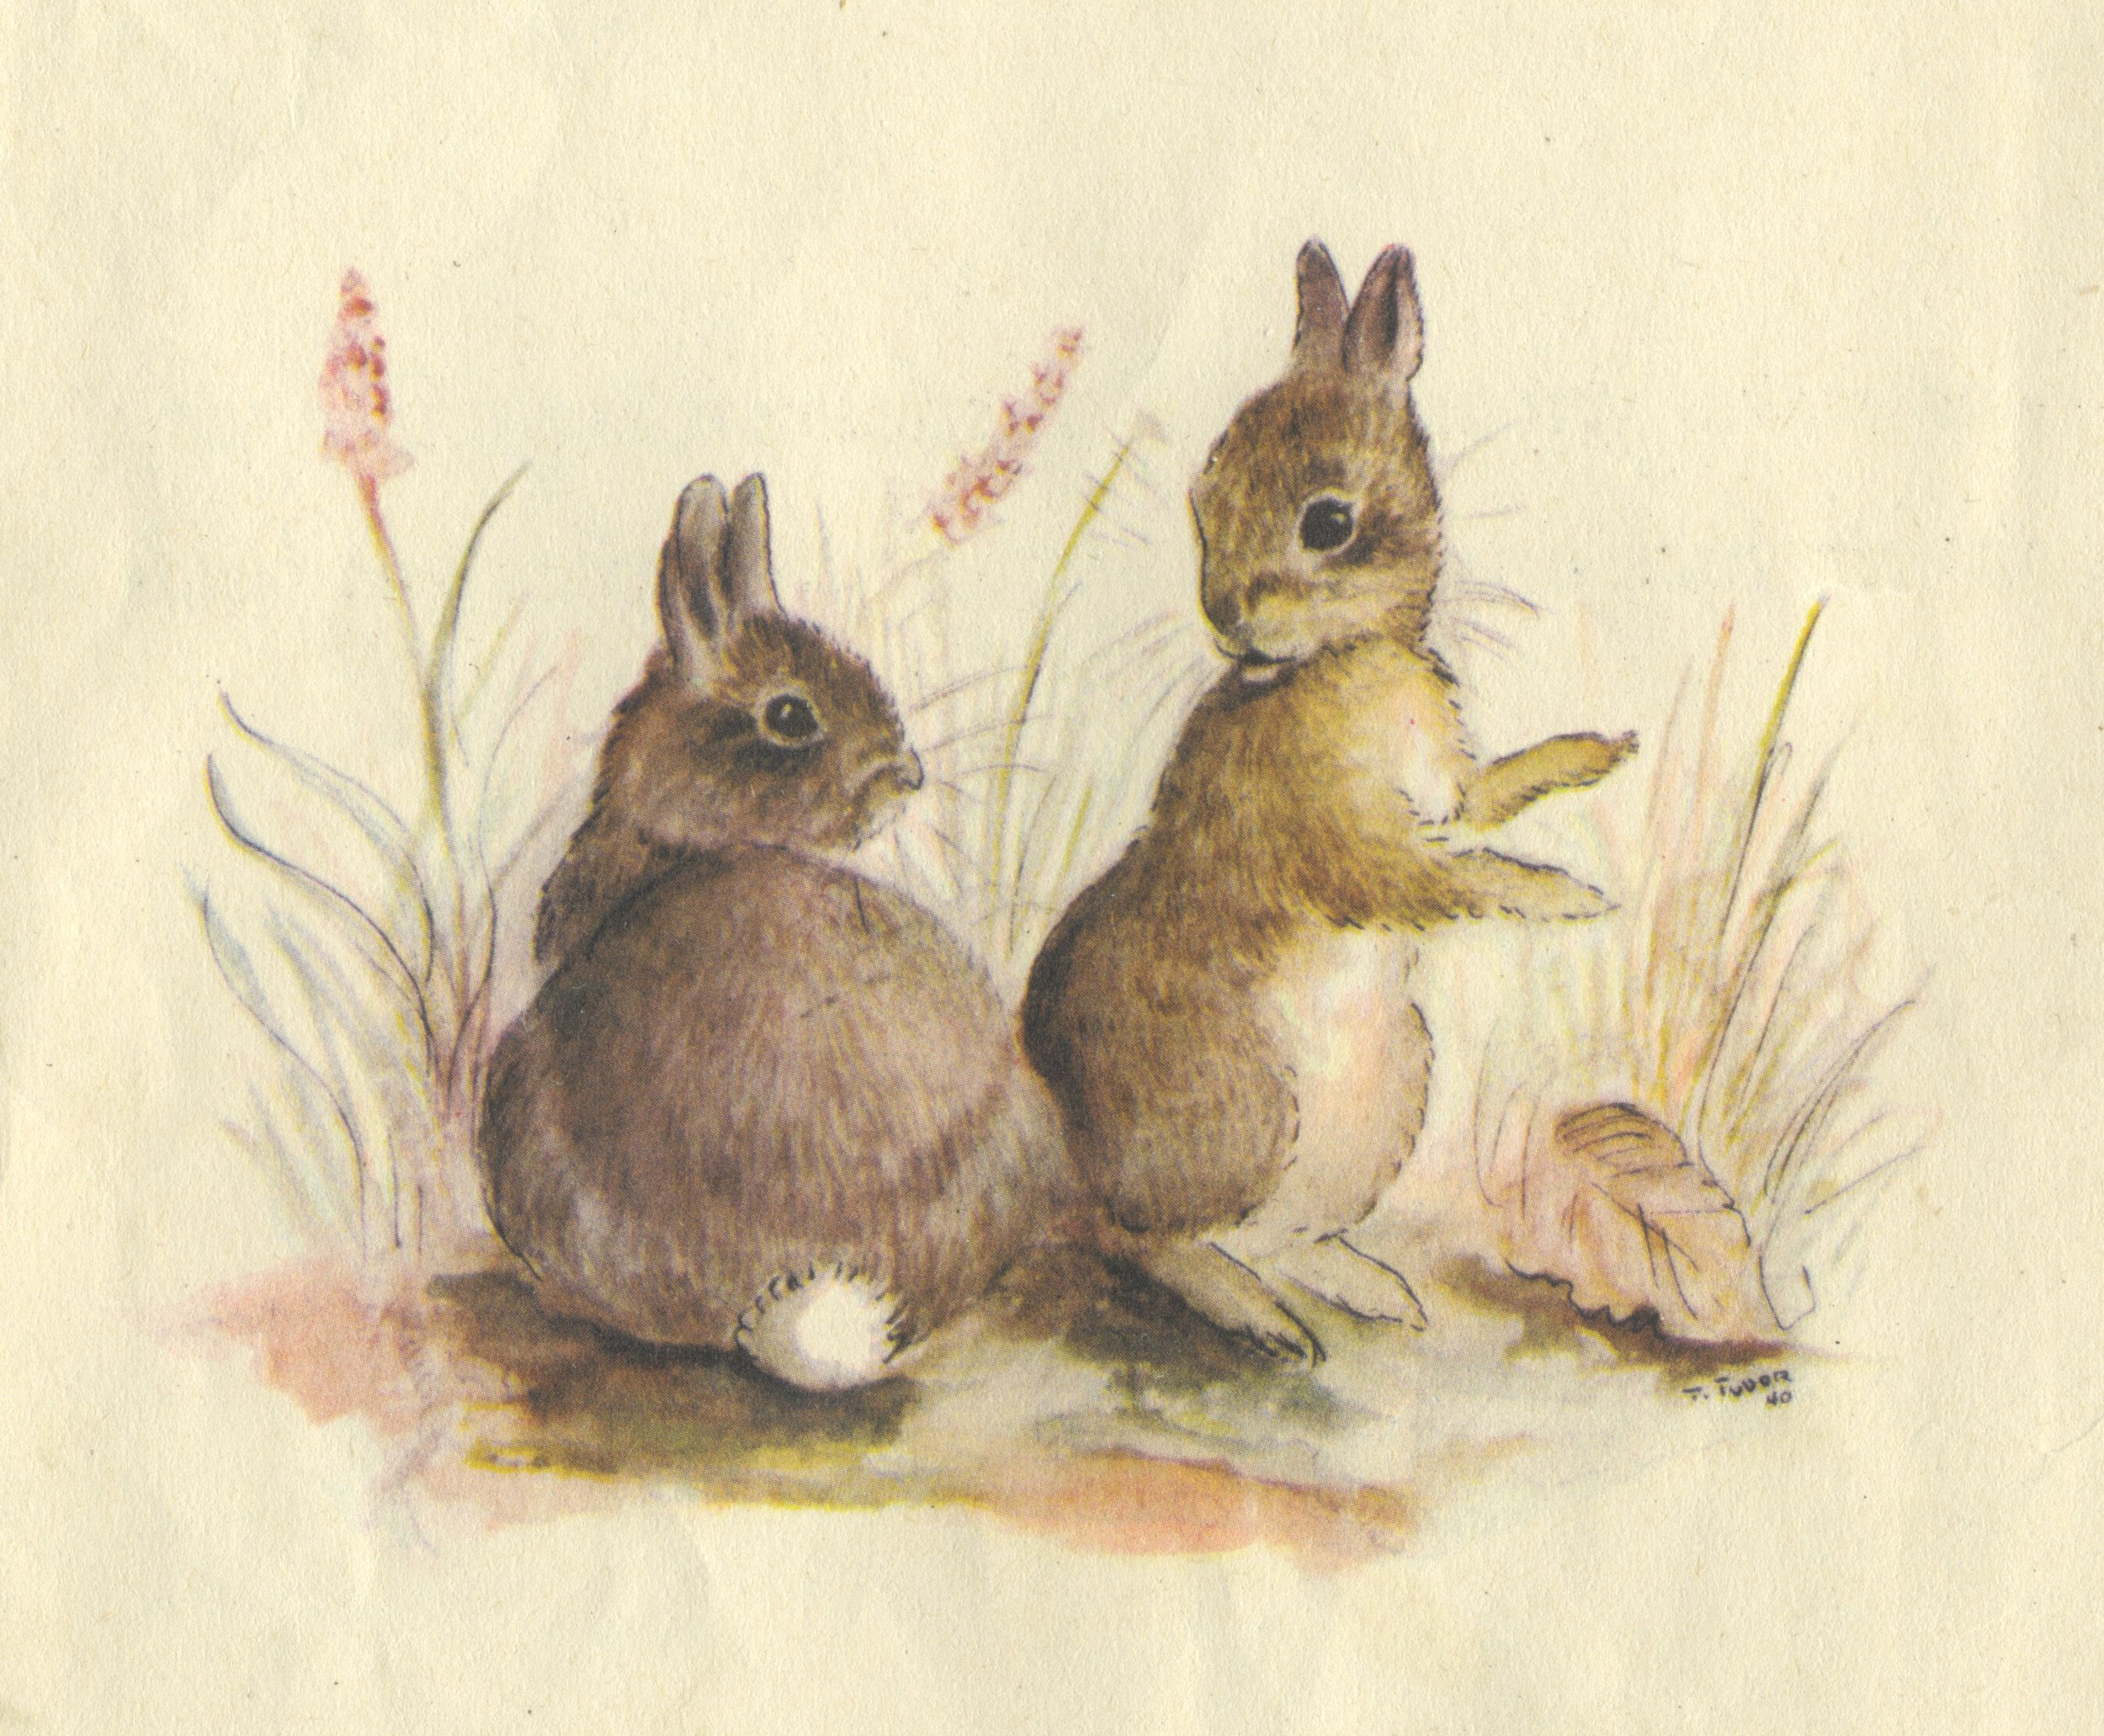 Illustration from the Tasha Tudor book